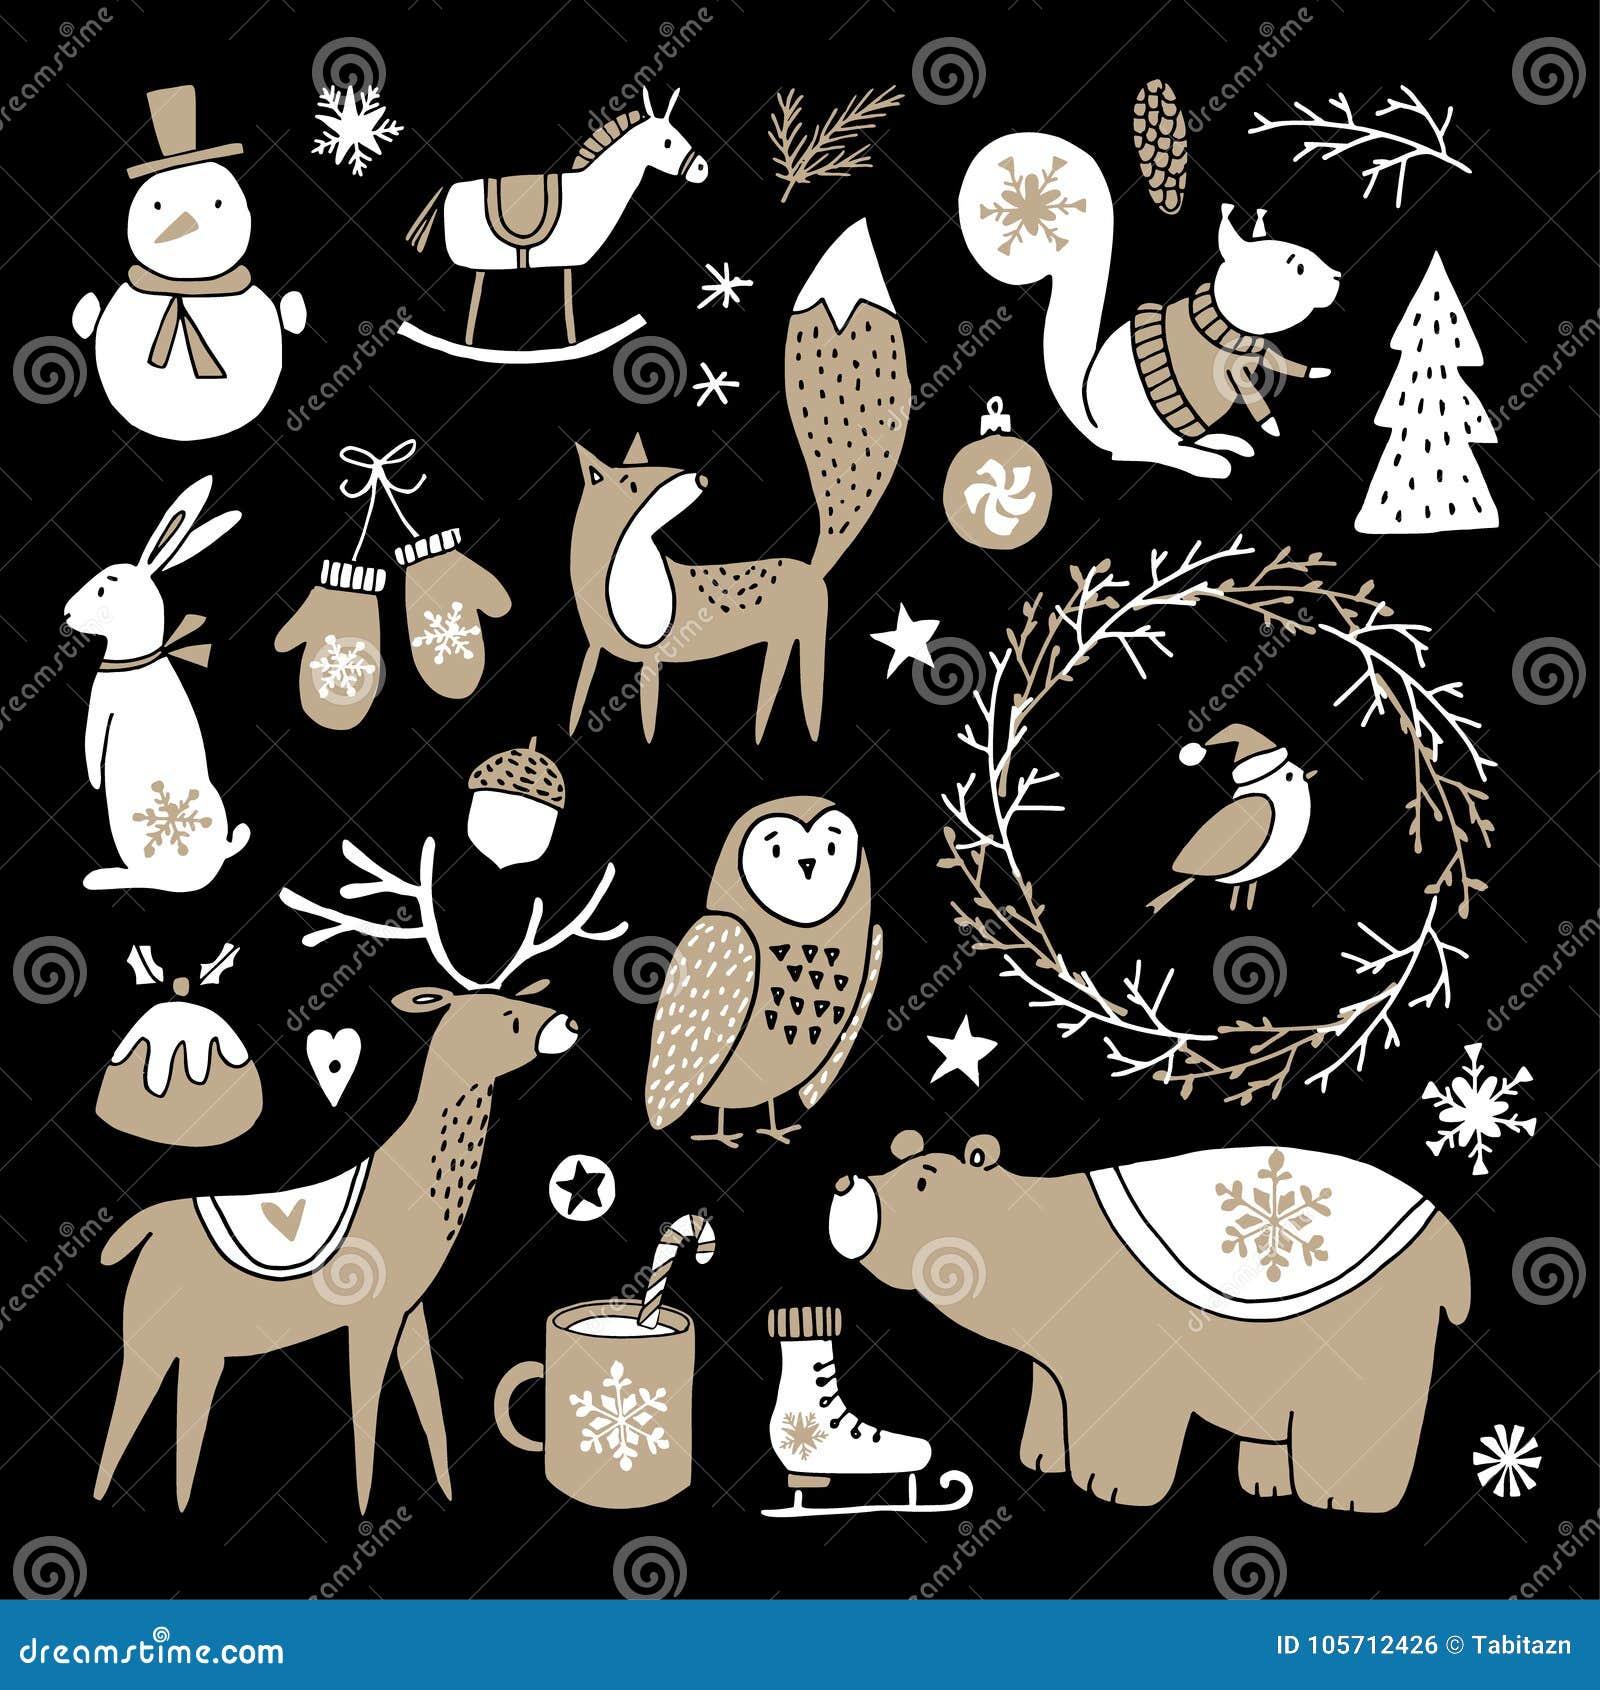 Set of cute doodle sketches. Christmas clip-arts of bear, bunny, reindeer, fox, owl, squirrel and snowman. Scandinavian